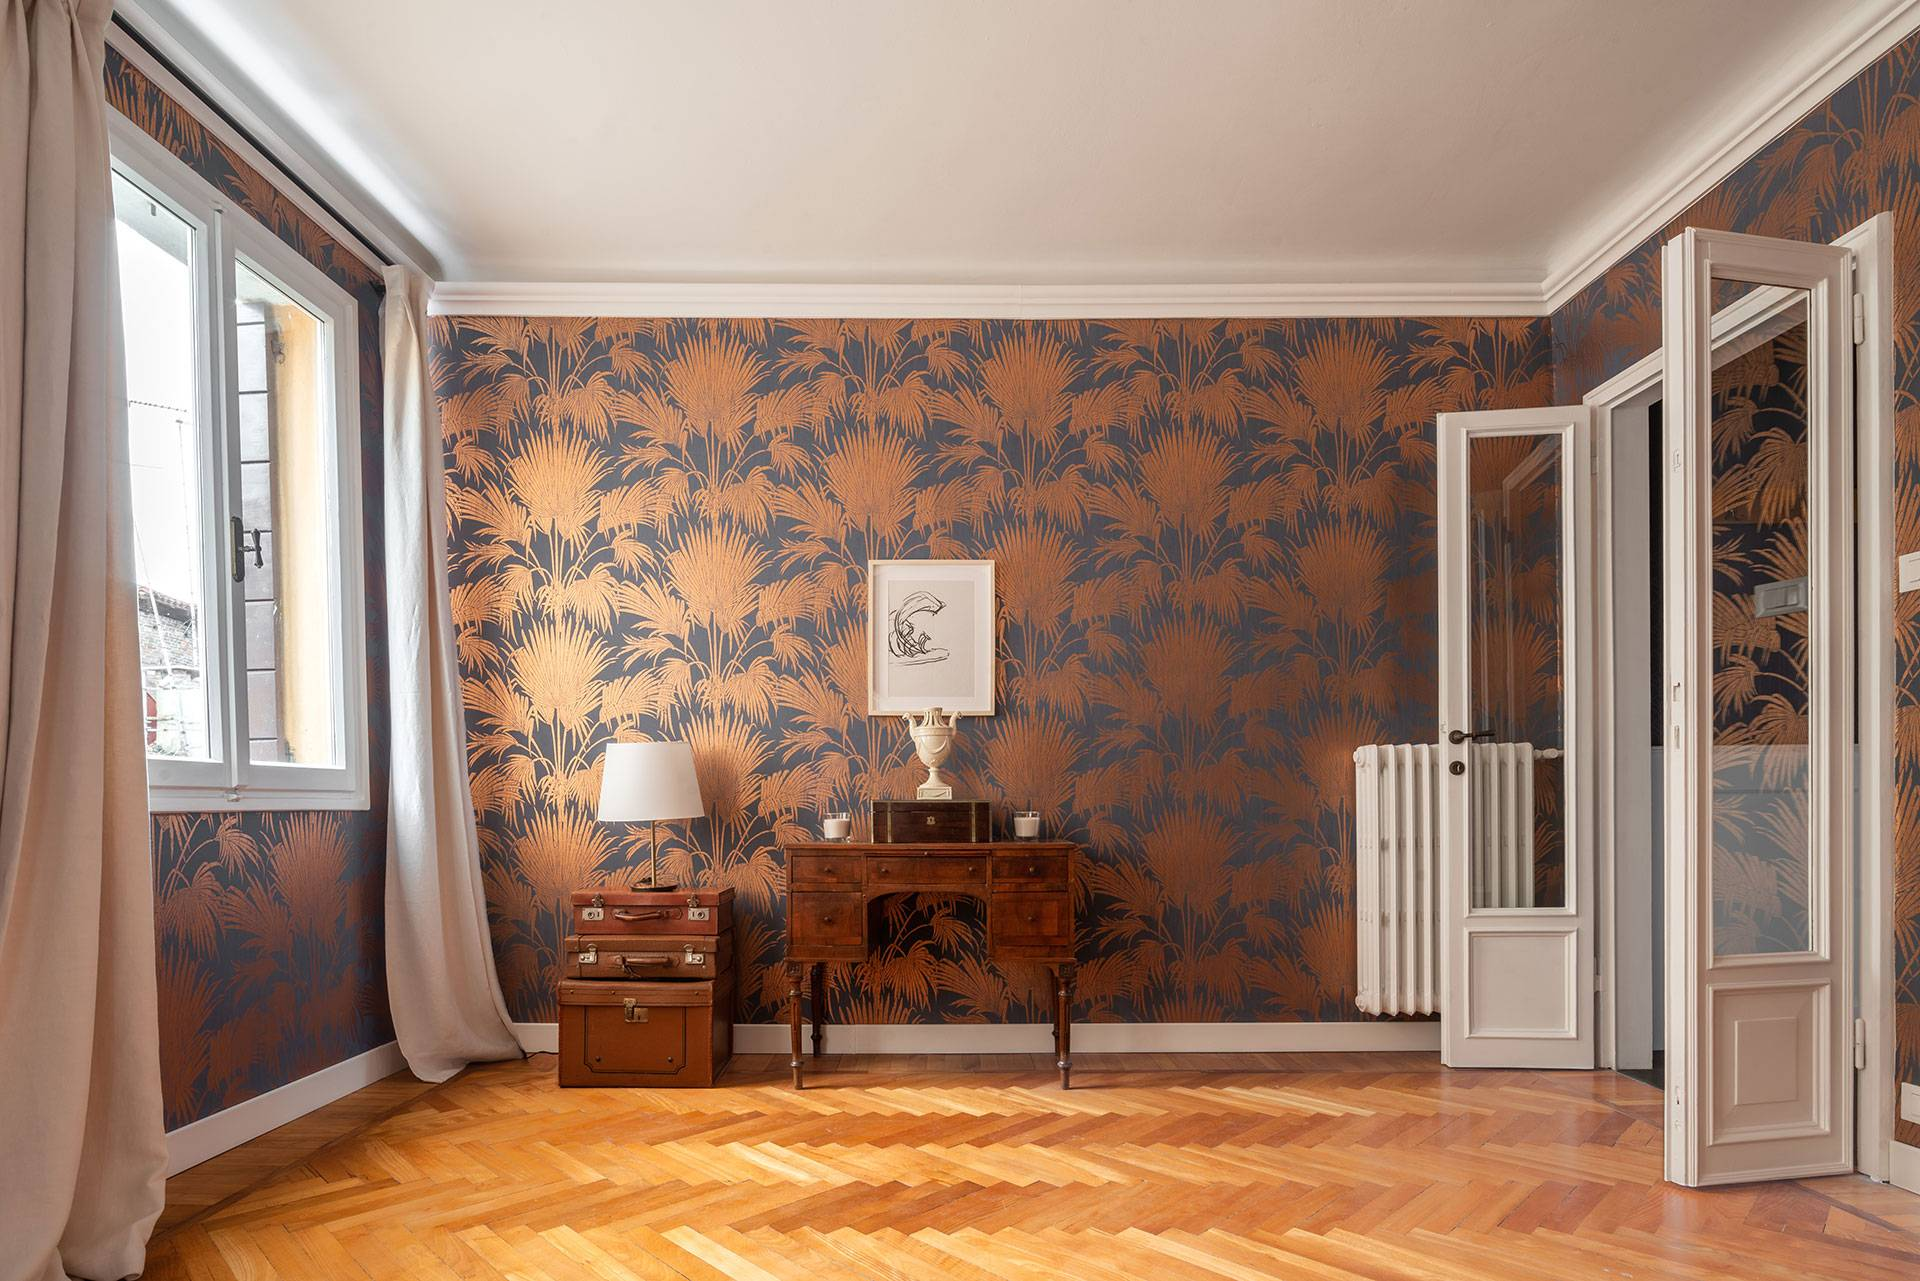 4th floor: single bedroom